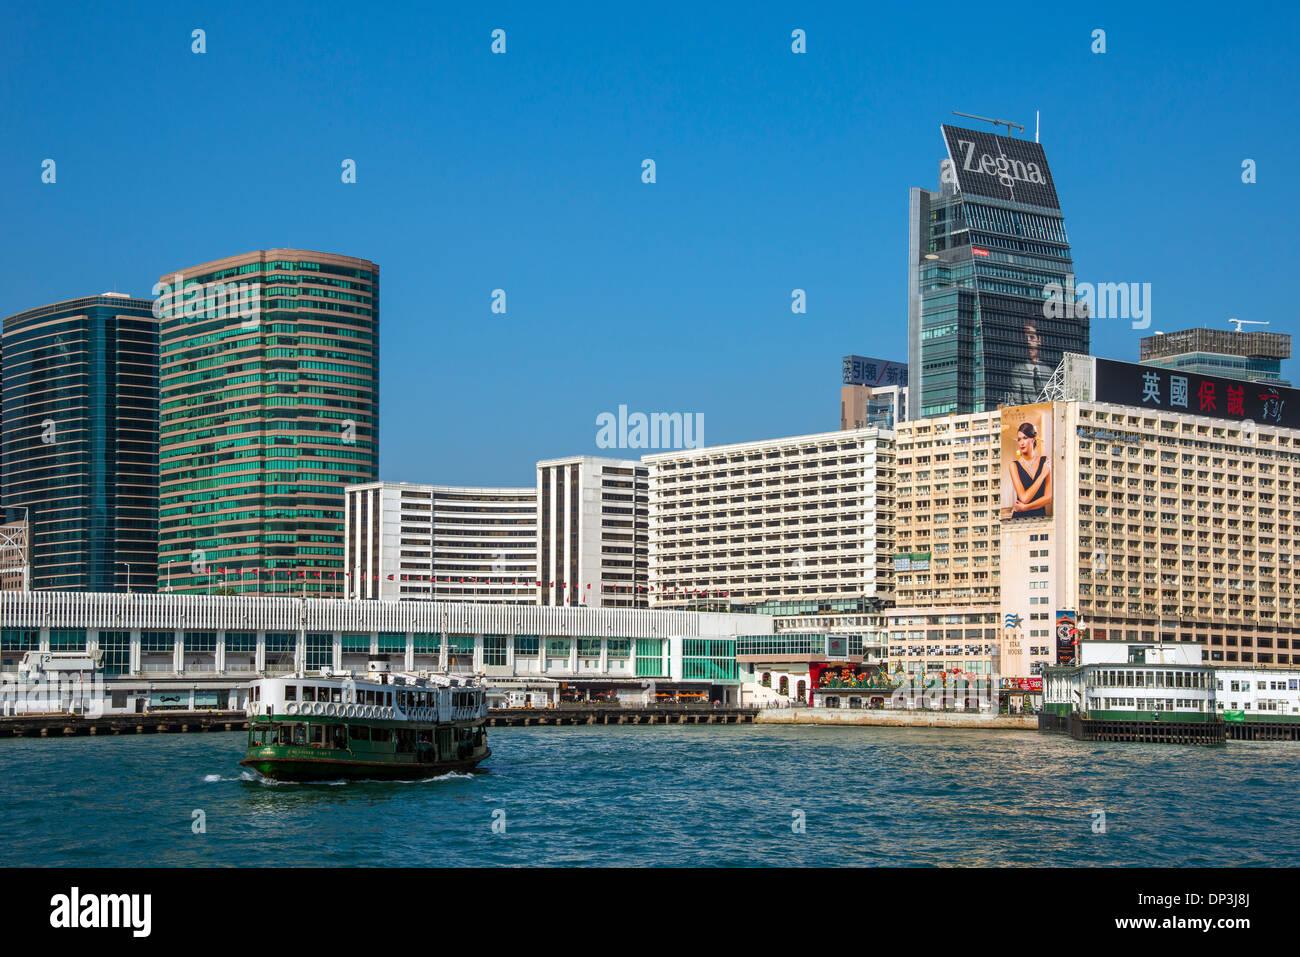 Kowloon Waterfront and Star Ferries, Hong Kong - Stock Image